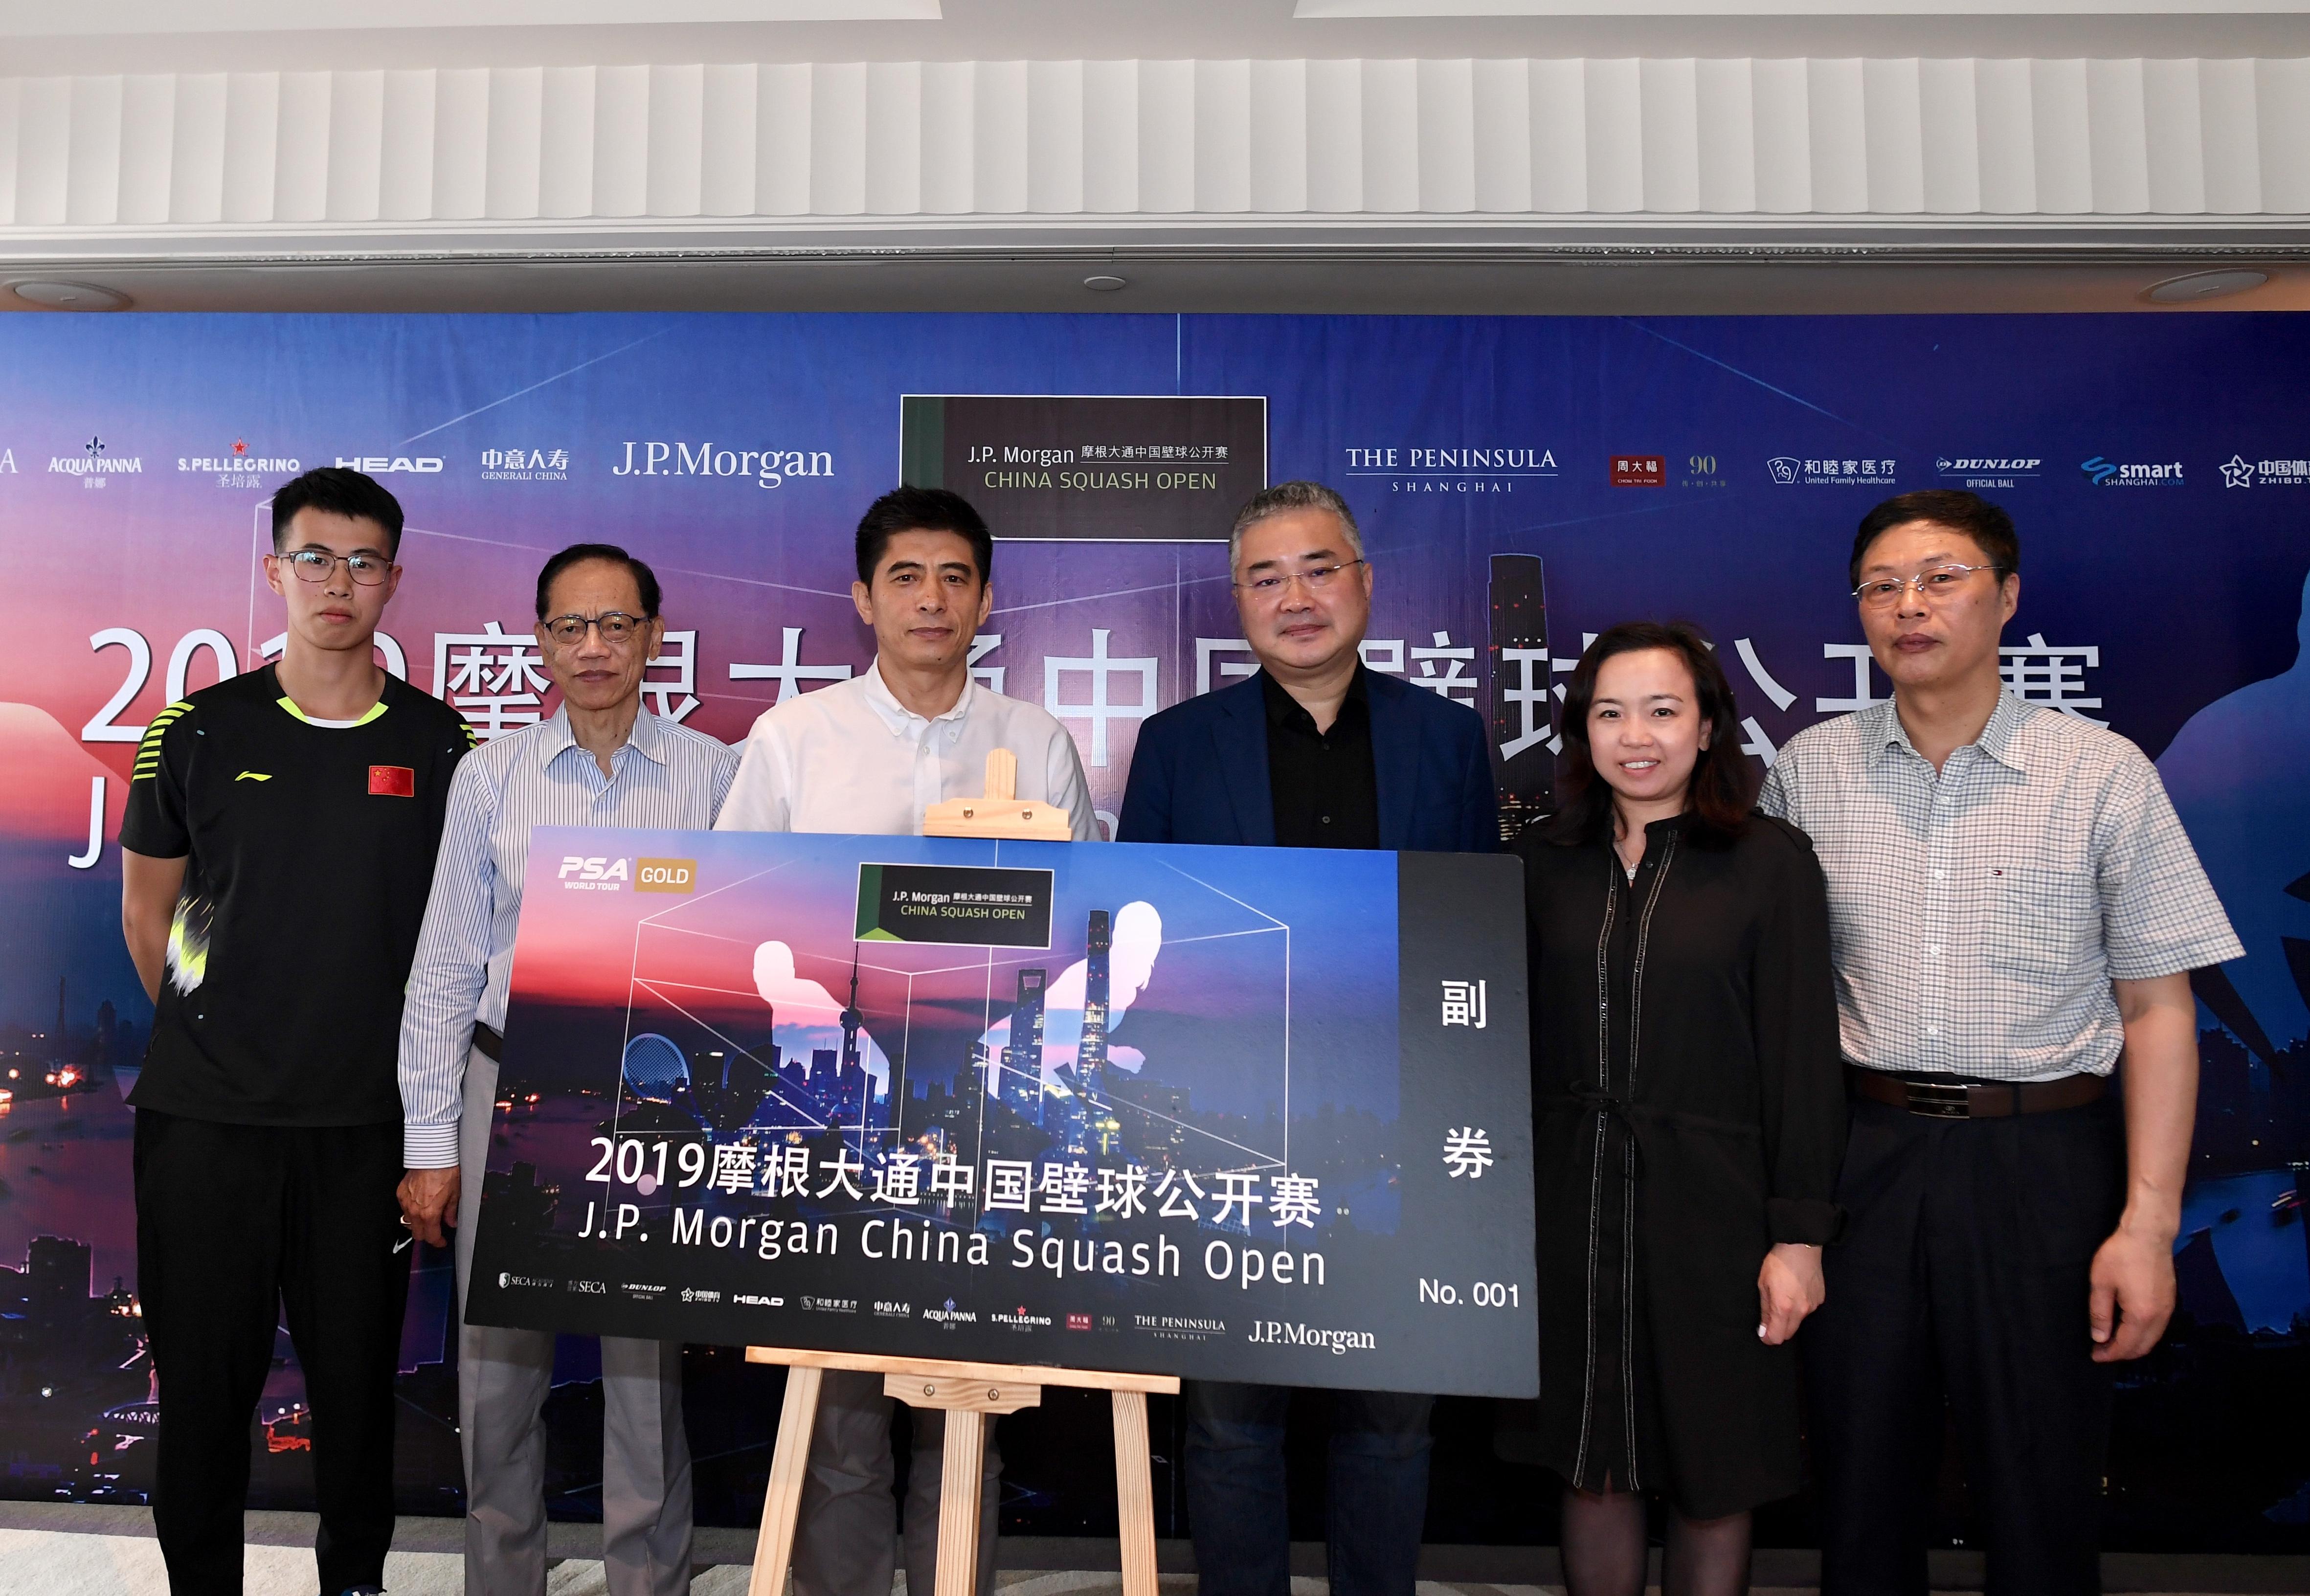 PSA世界巡回赛首站落地上海 2019中国壁球公开赛9月开拍